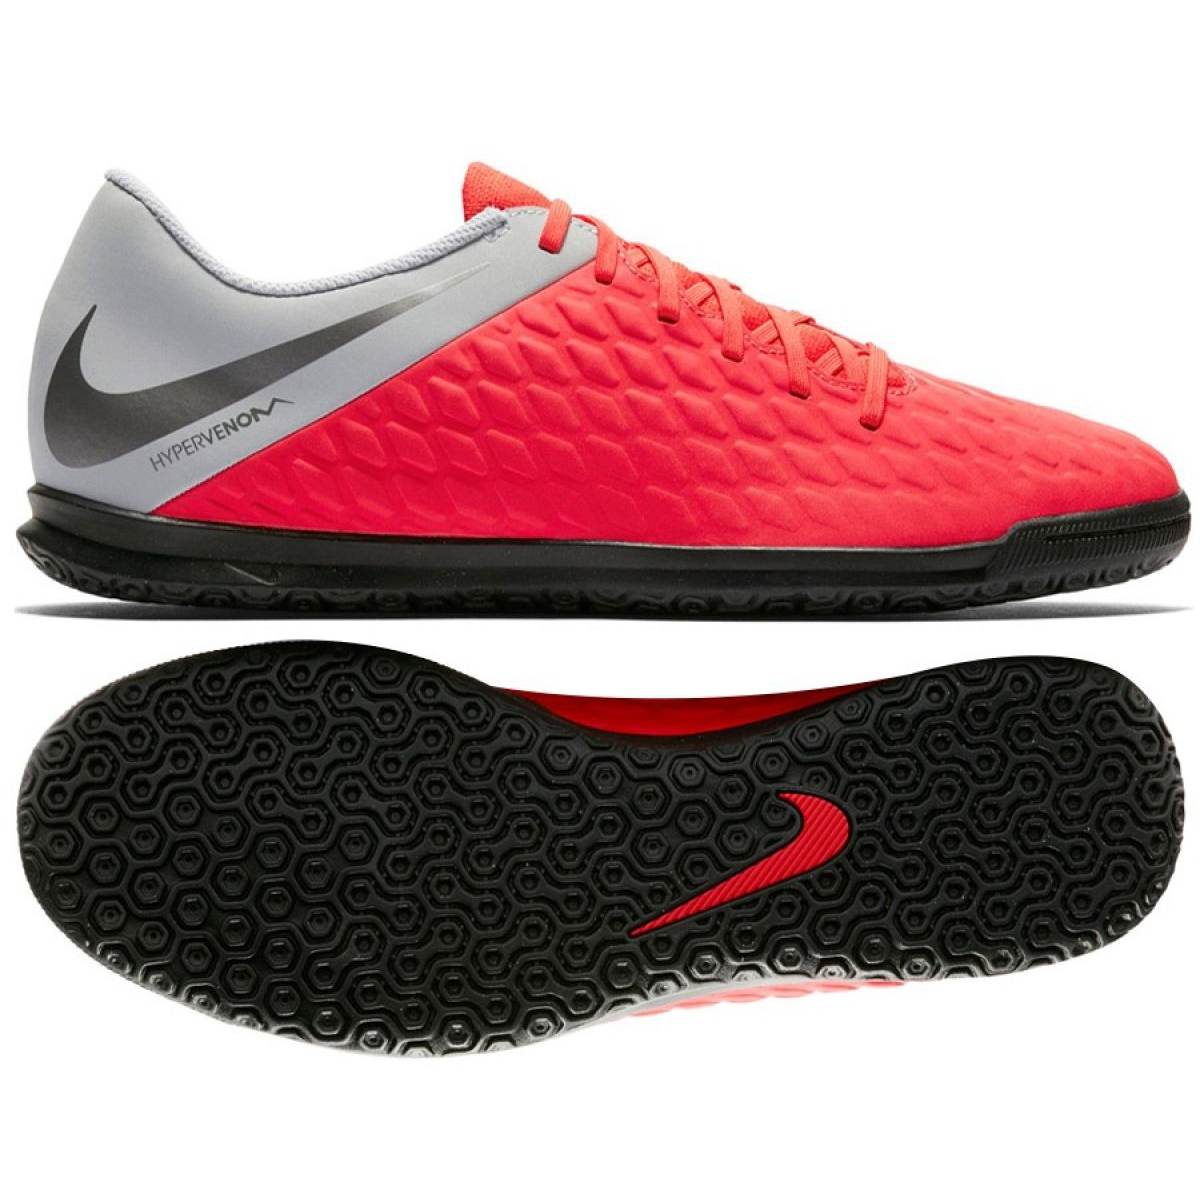 best loved ace84 7cd72 Indoor shoes Nike Hypervenom PhantomX 3 Club Ic Jr AJ3789-600